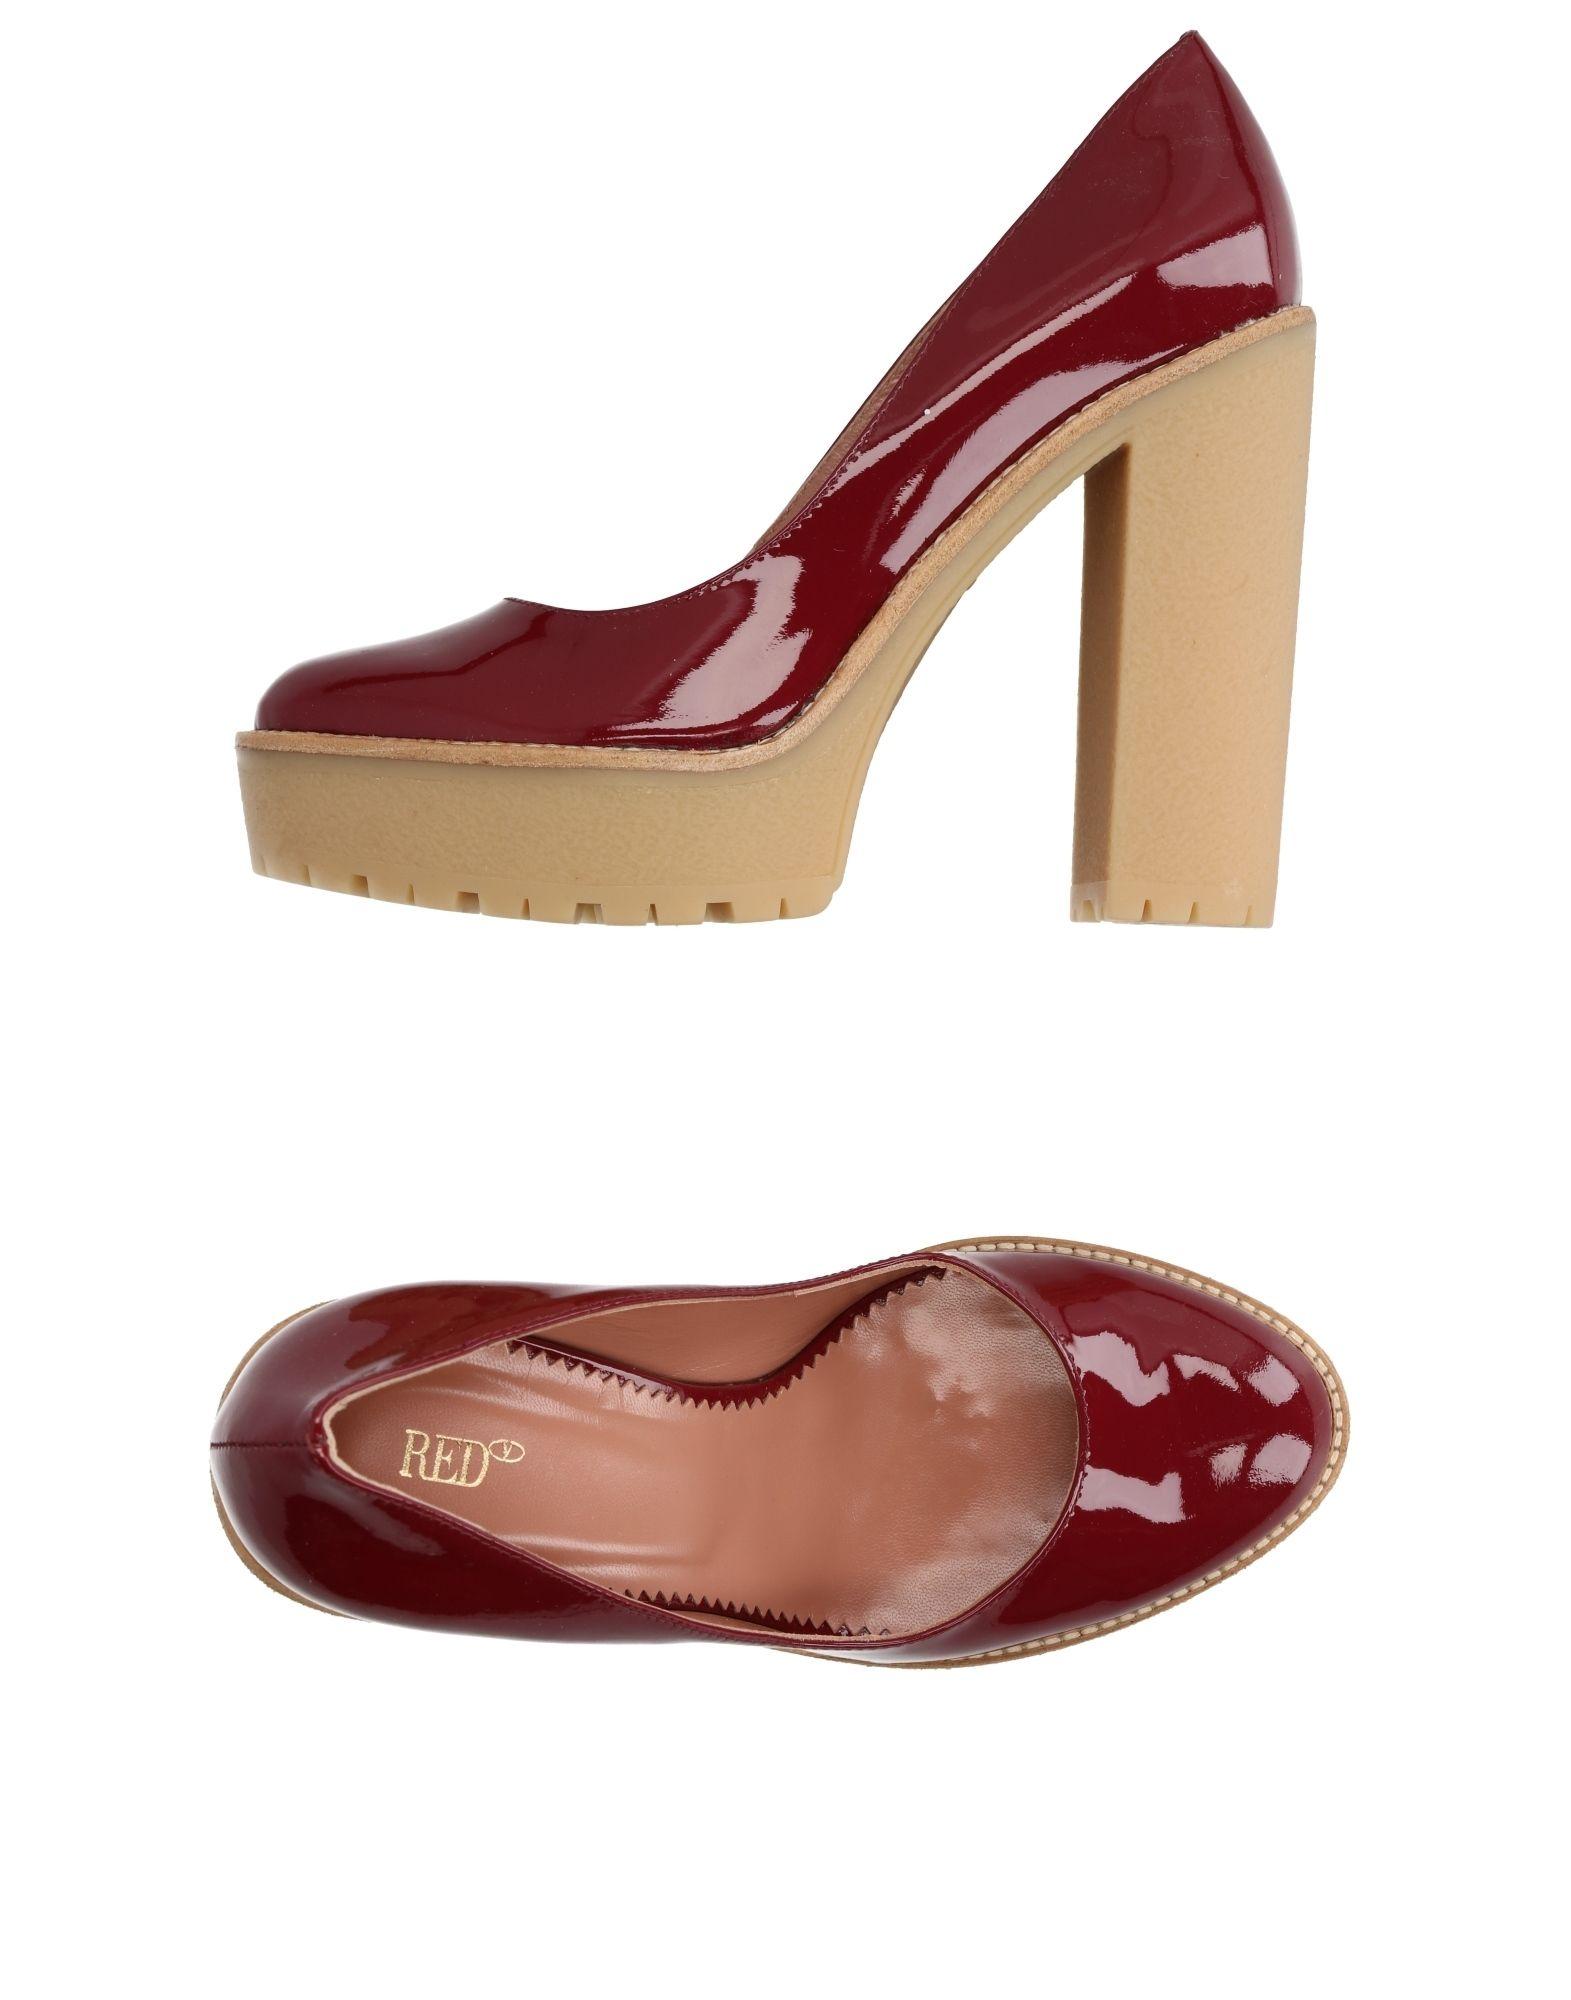 Moda Décolleté Red(V) Donna - 11286982HC